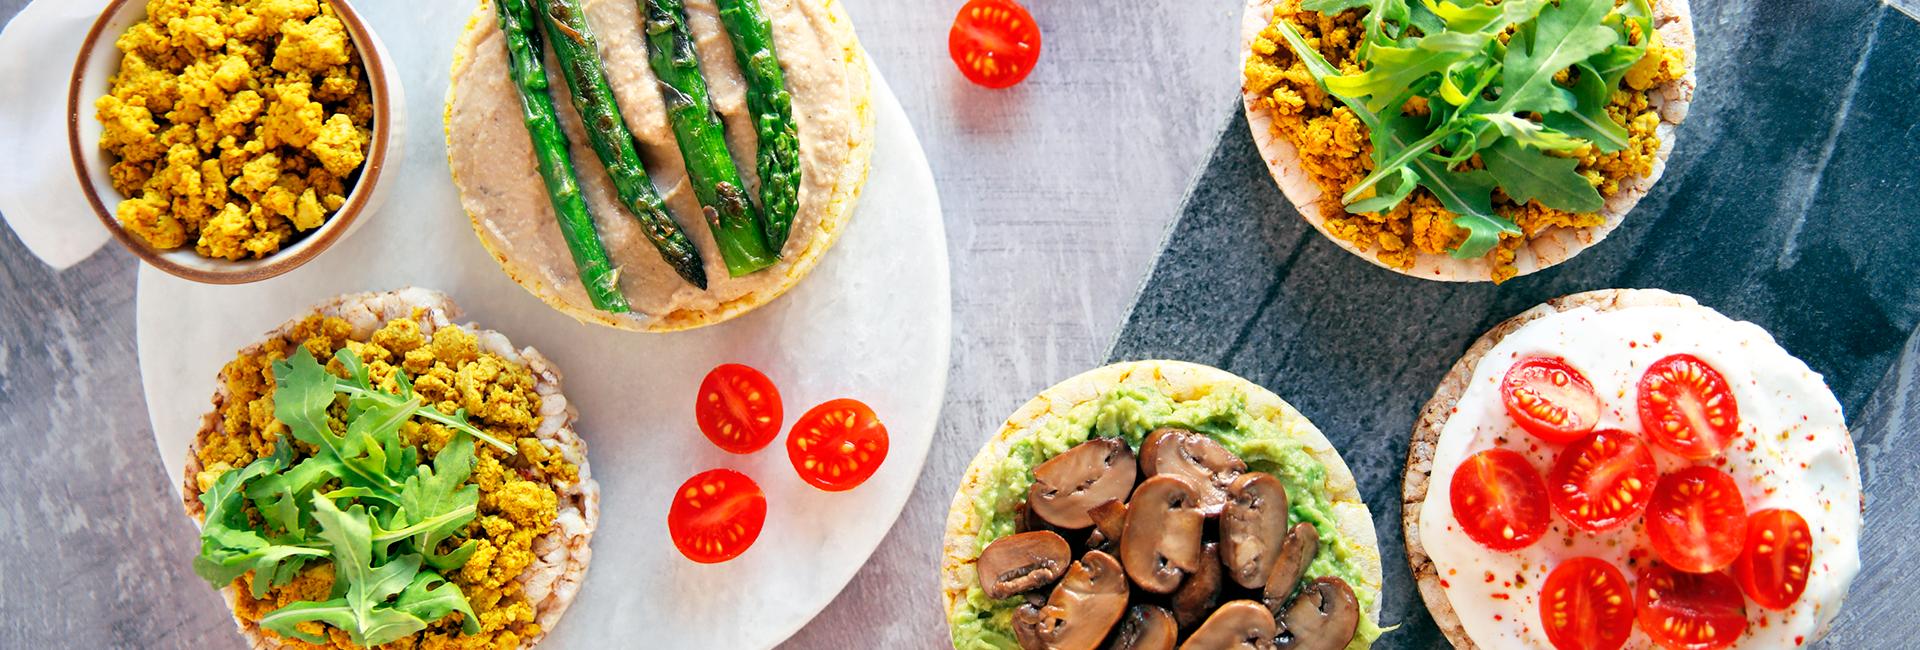 Cenas fáciles con tortitas Ecocesta